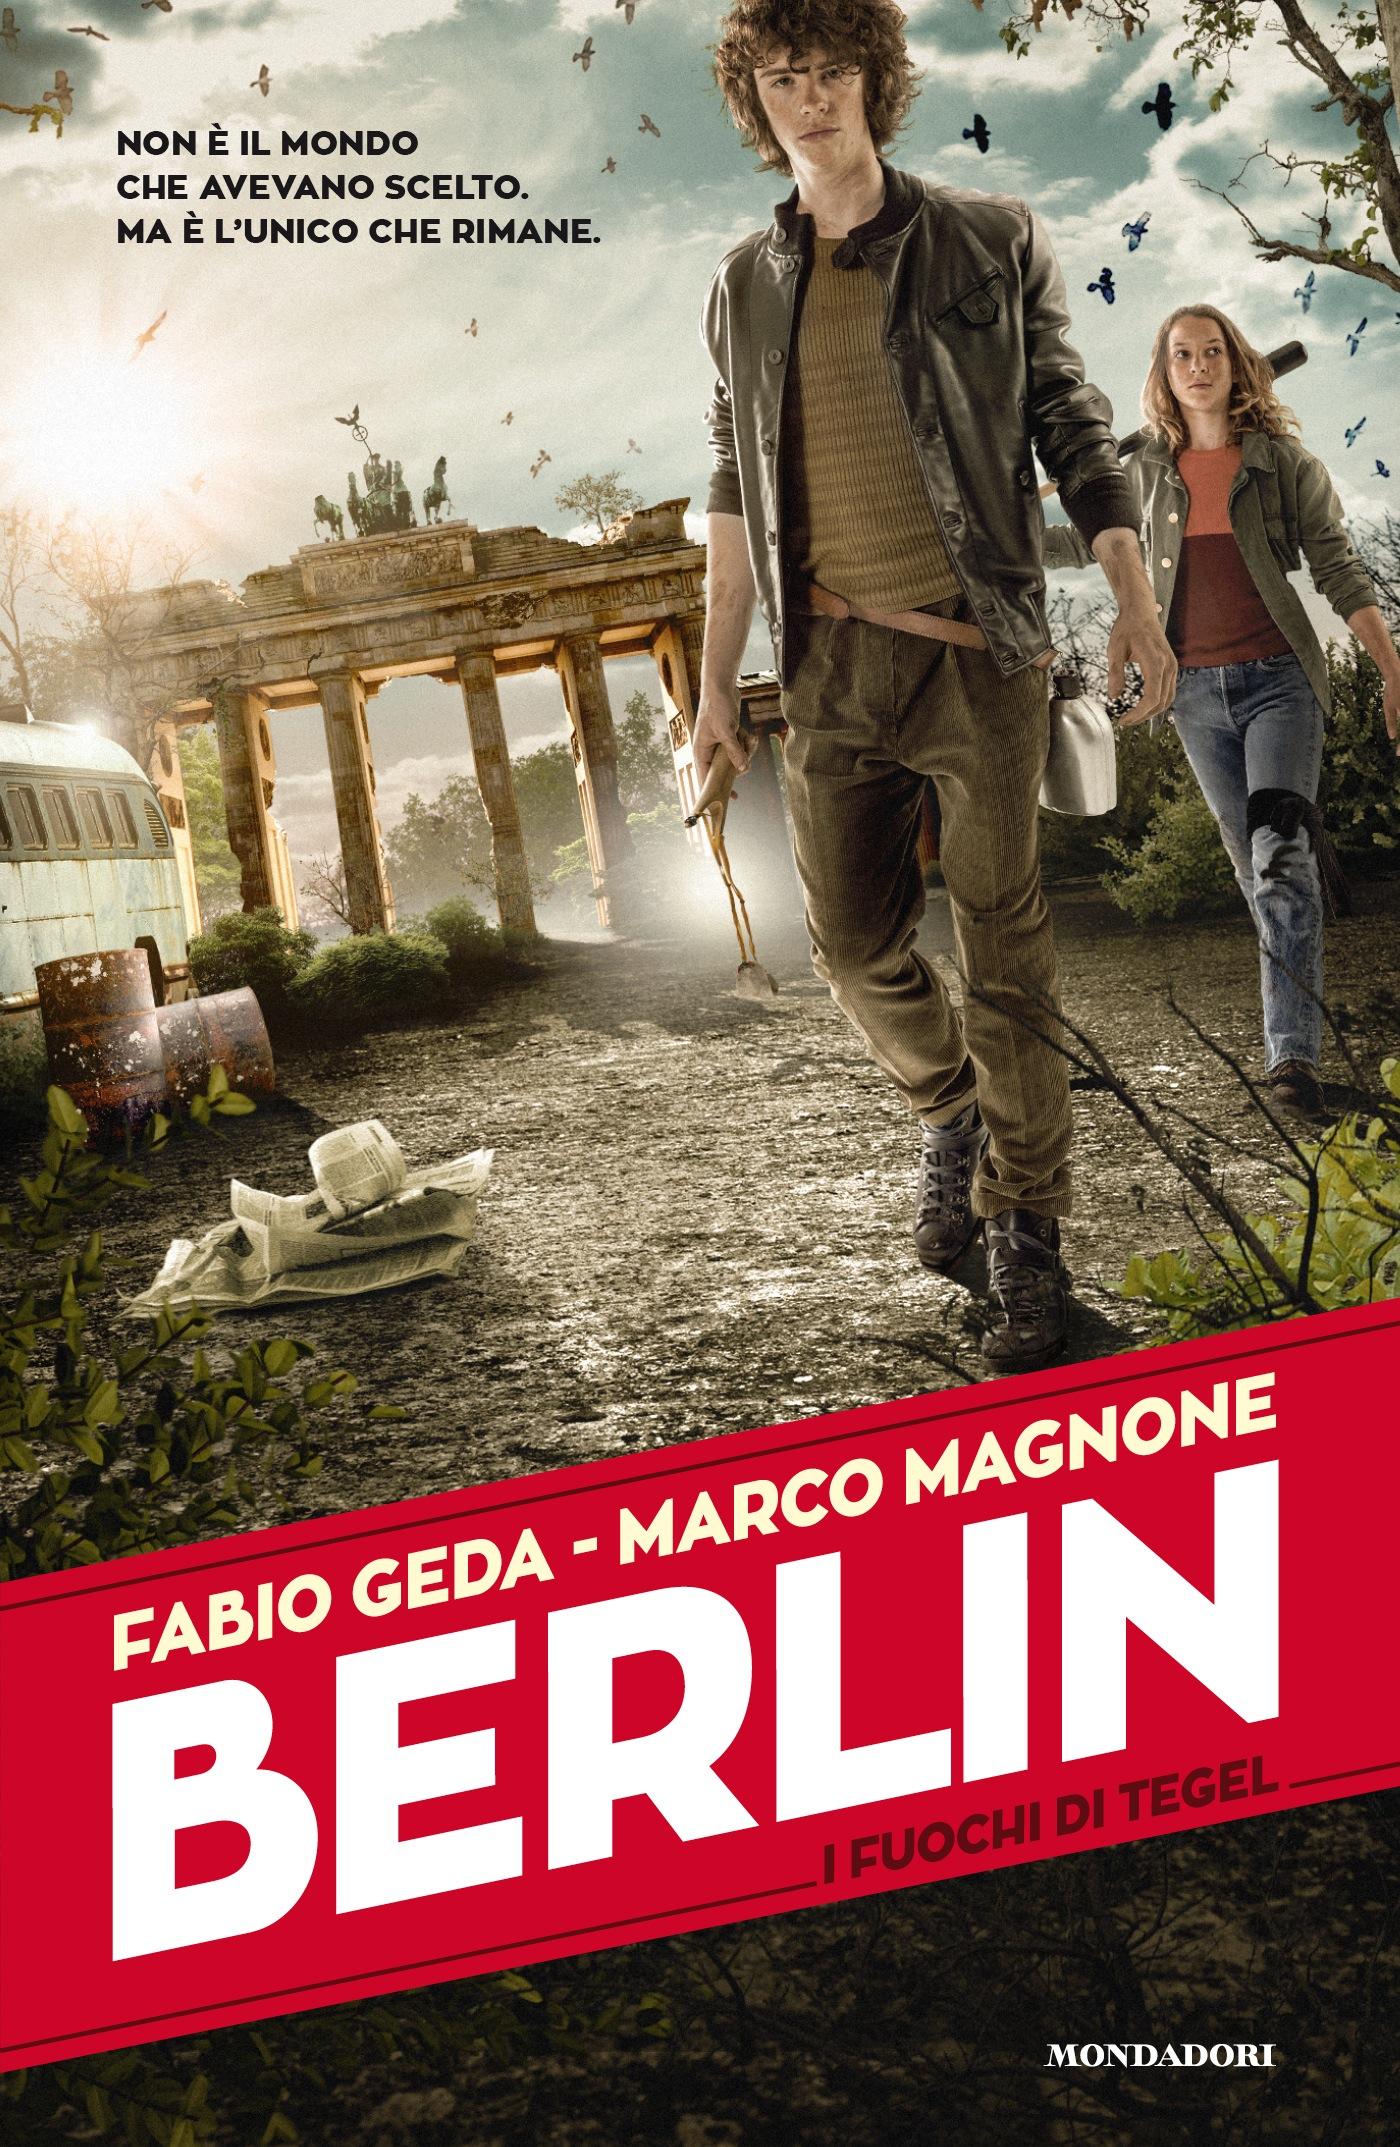 Berlin – Il fuochi di Tegel / Die Feuer von Tegel